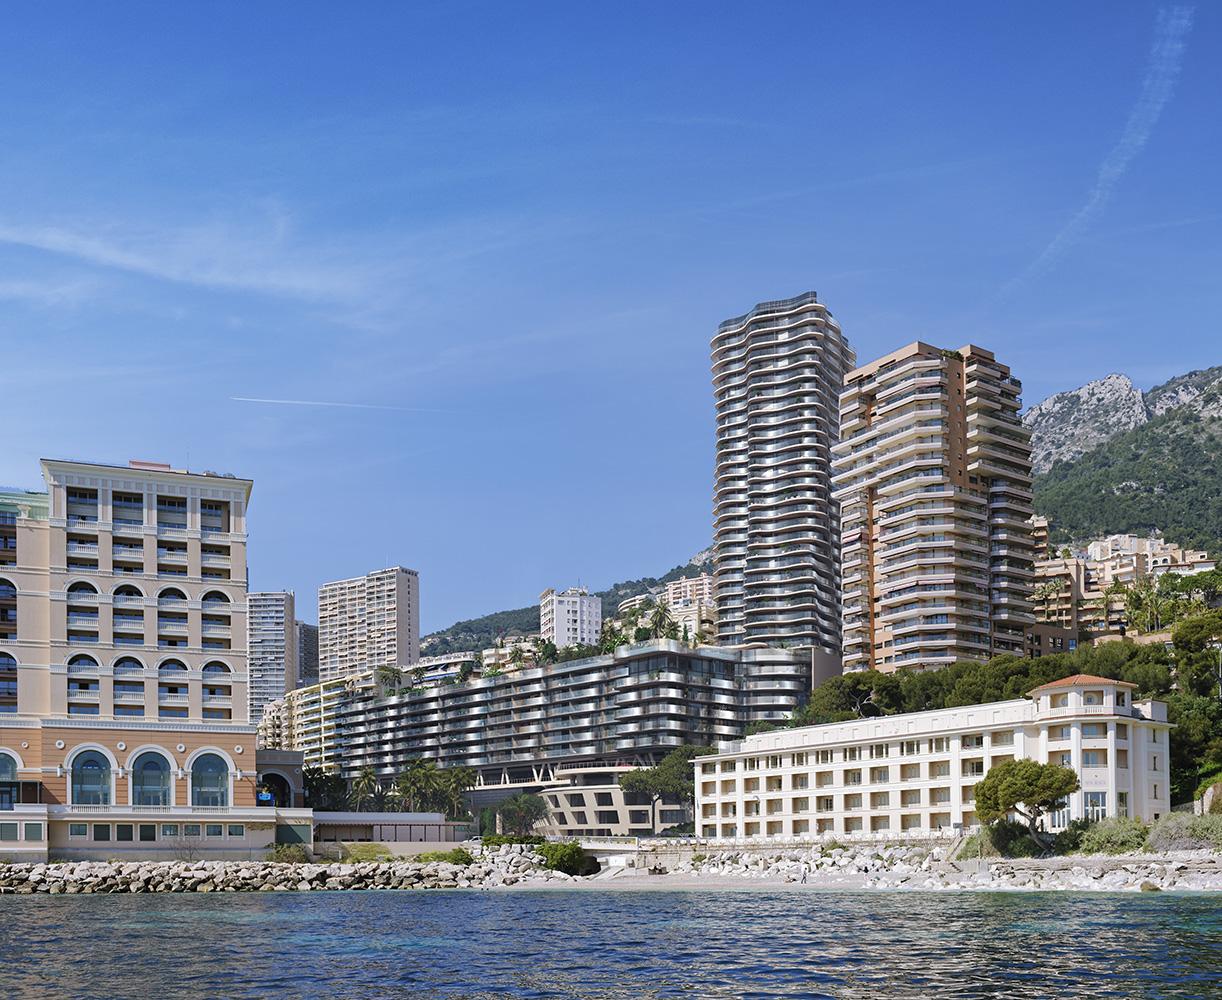 Marzocco_Tour_Monaco_05